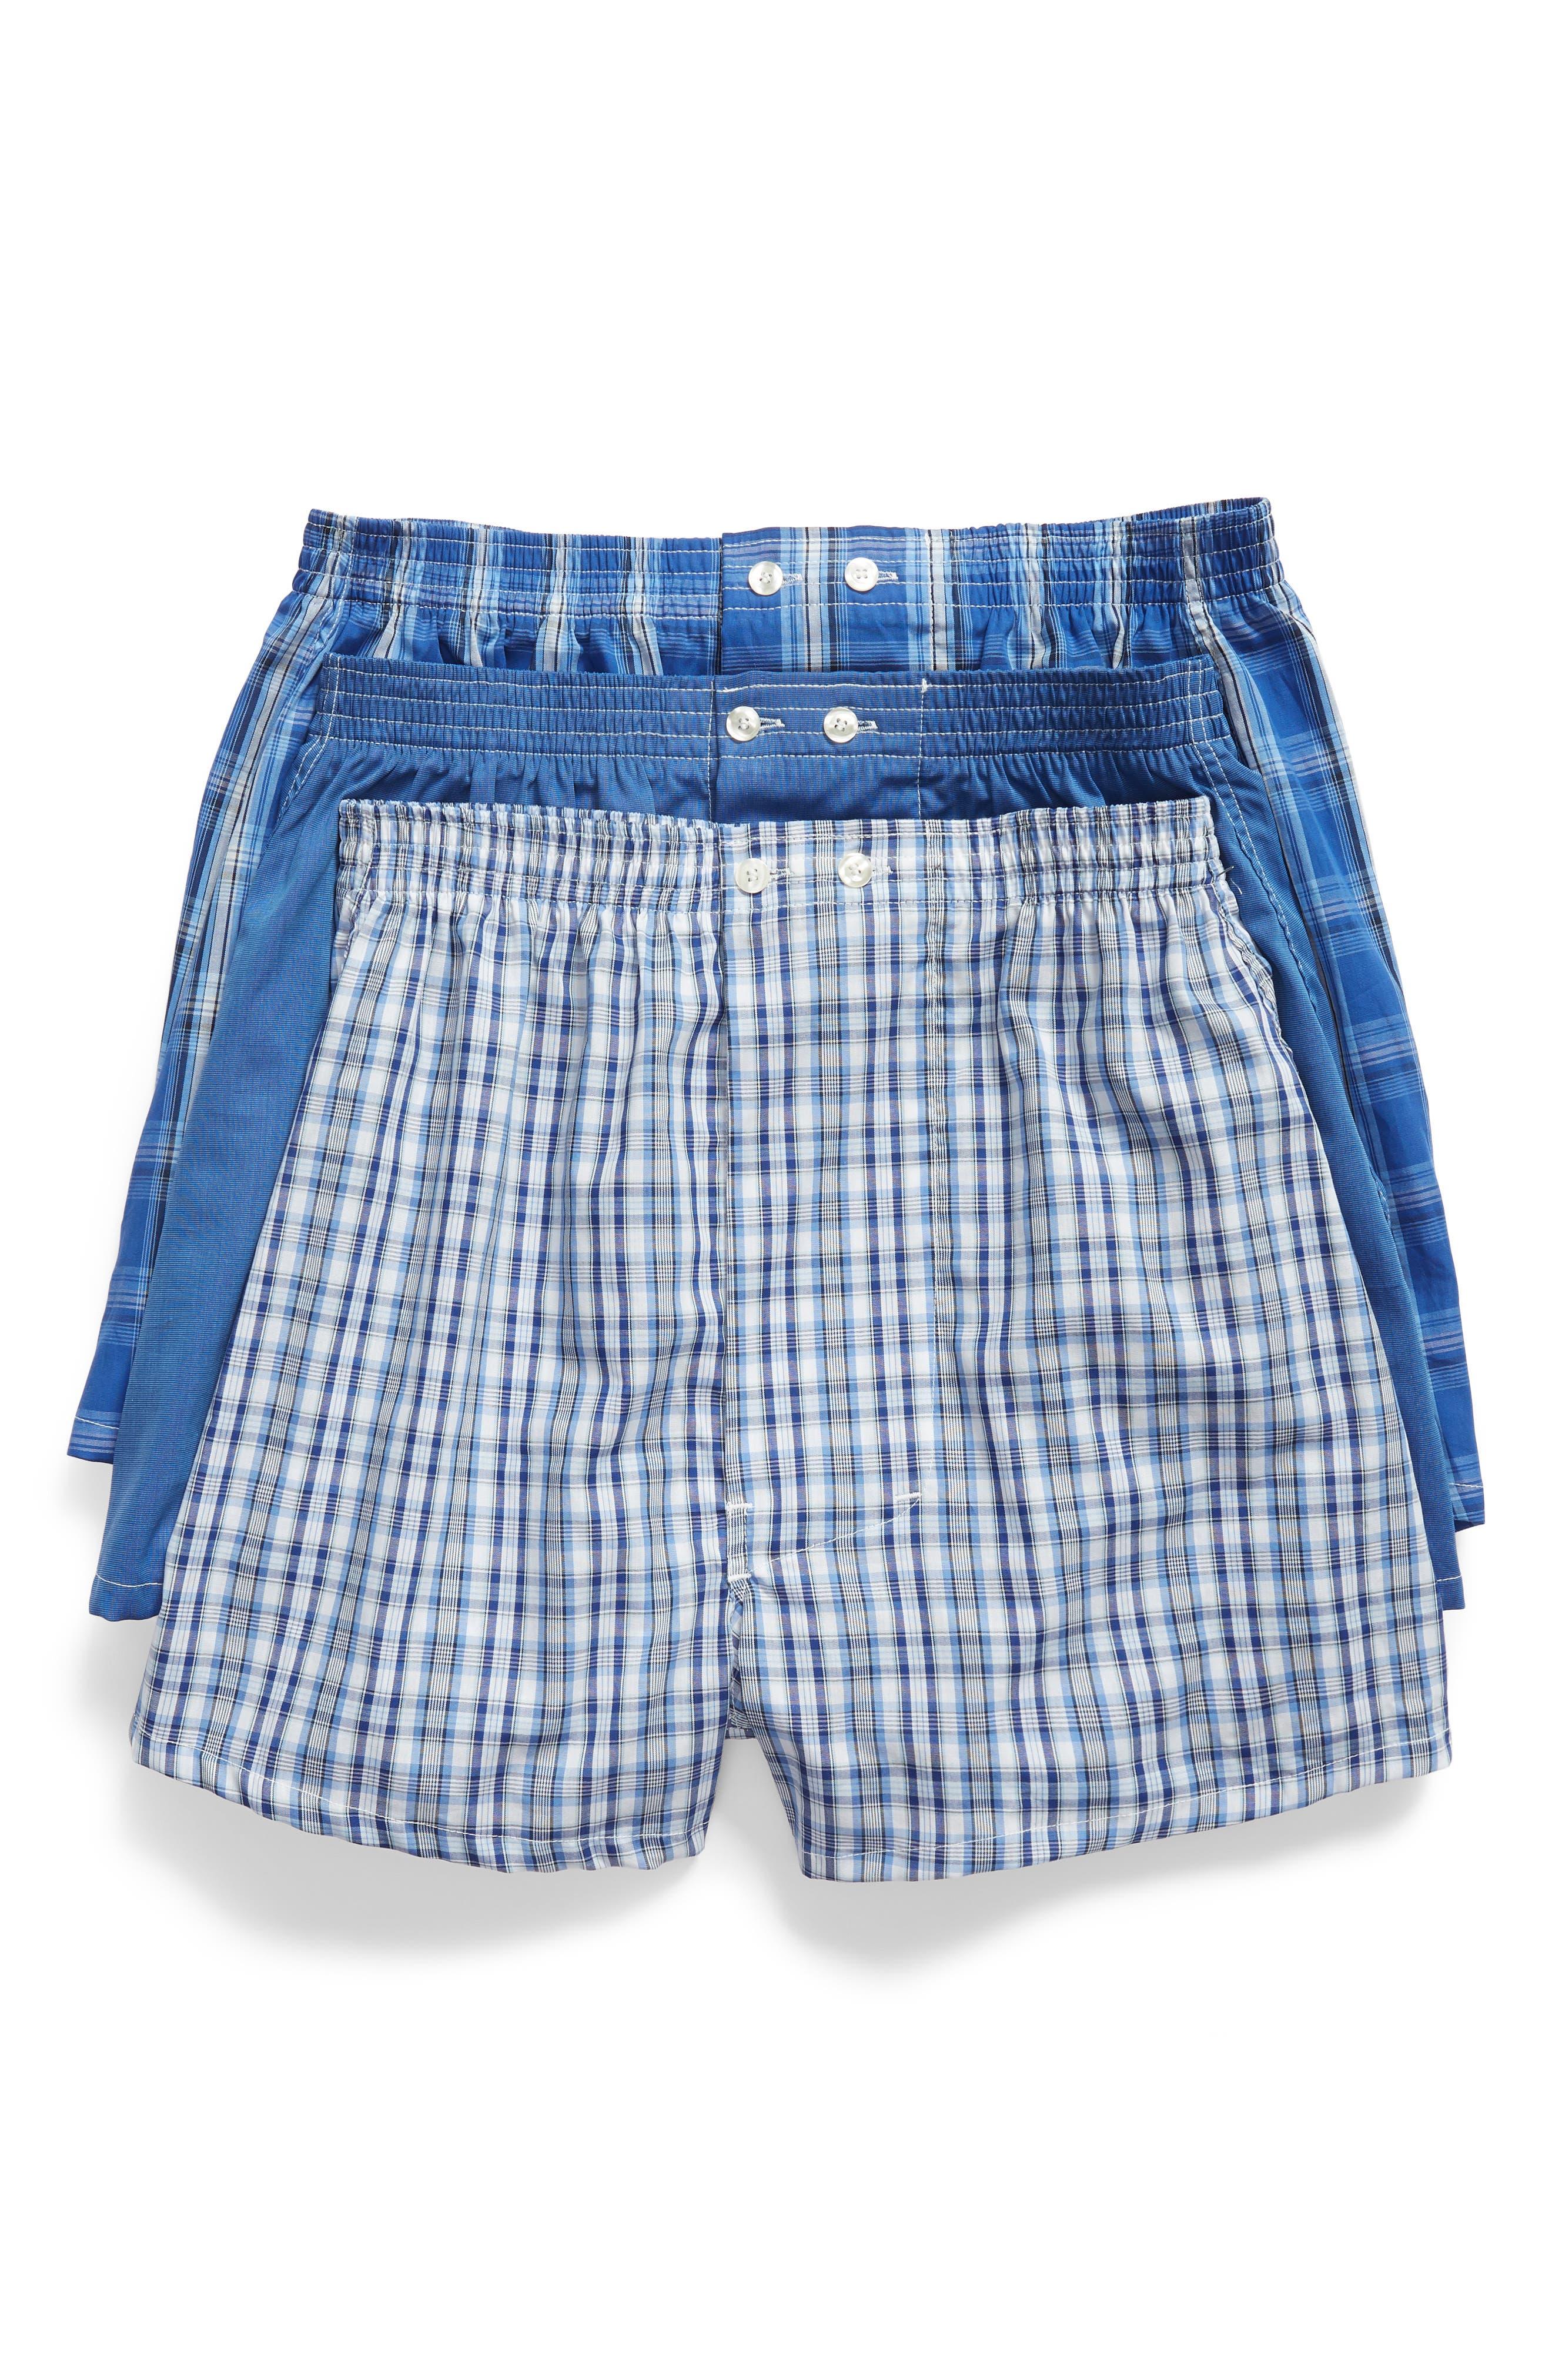 3-Pack Classic Fit Boxers,                         Main,                         color, BLUE DAZZLE SOLID- PLAID PACK